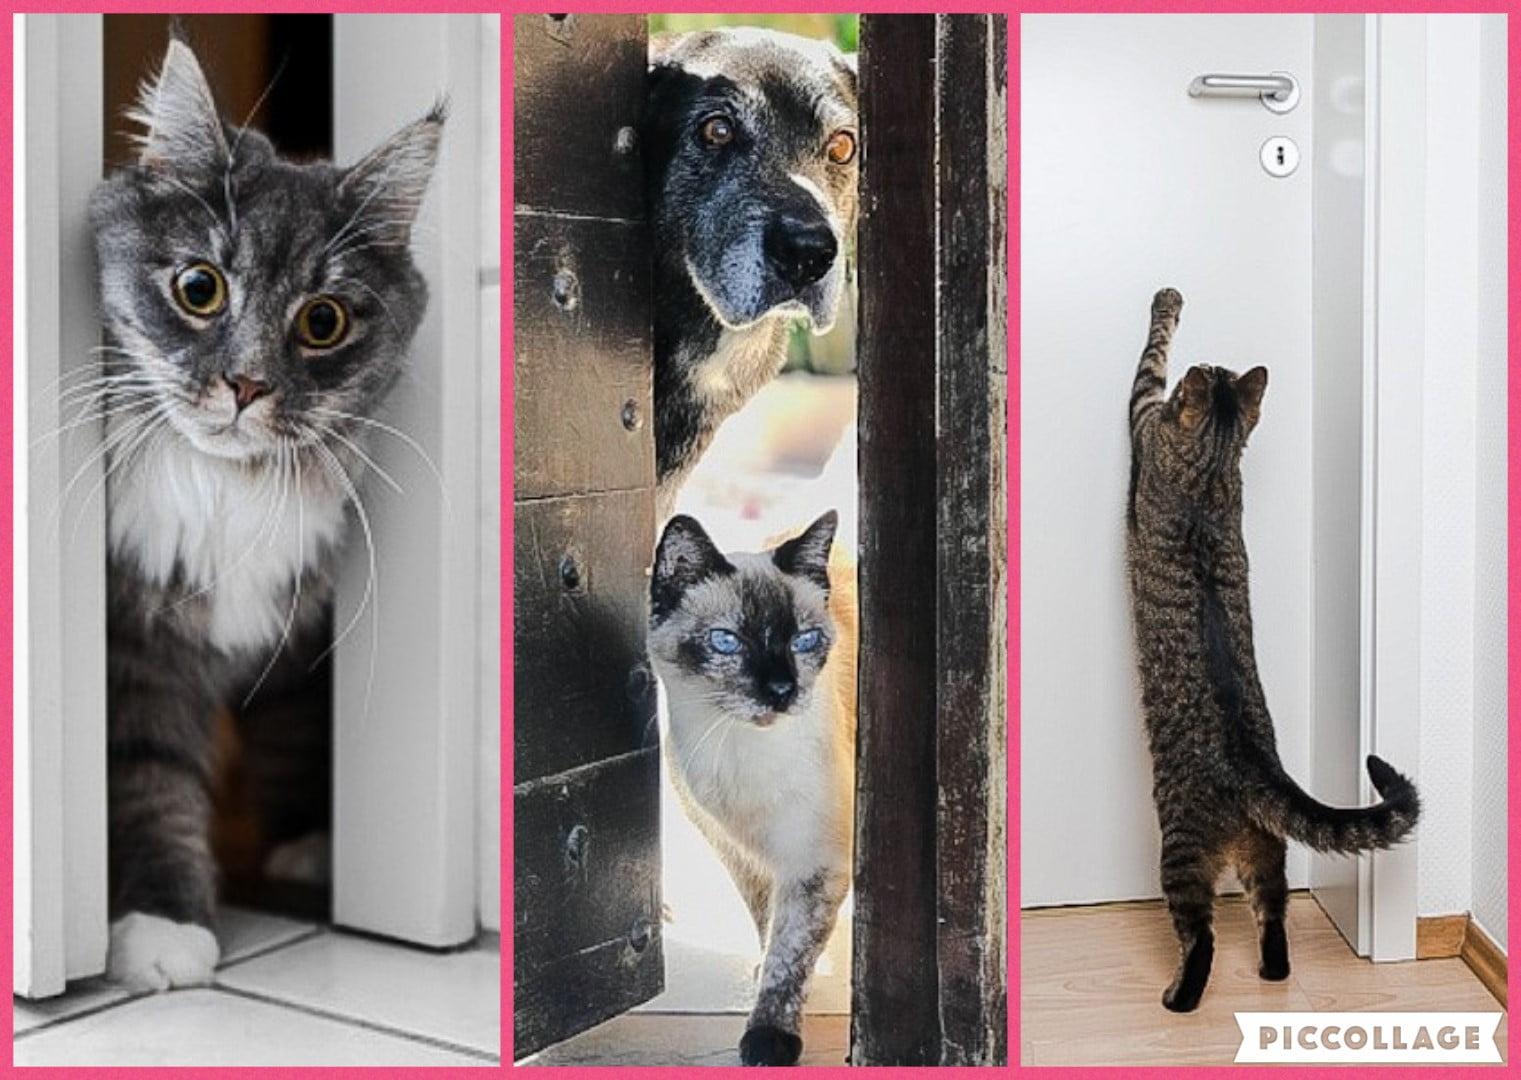 Why do cats dislike doors?